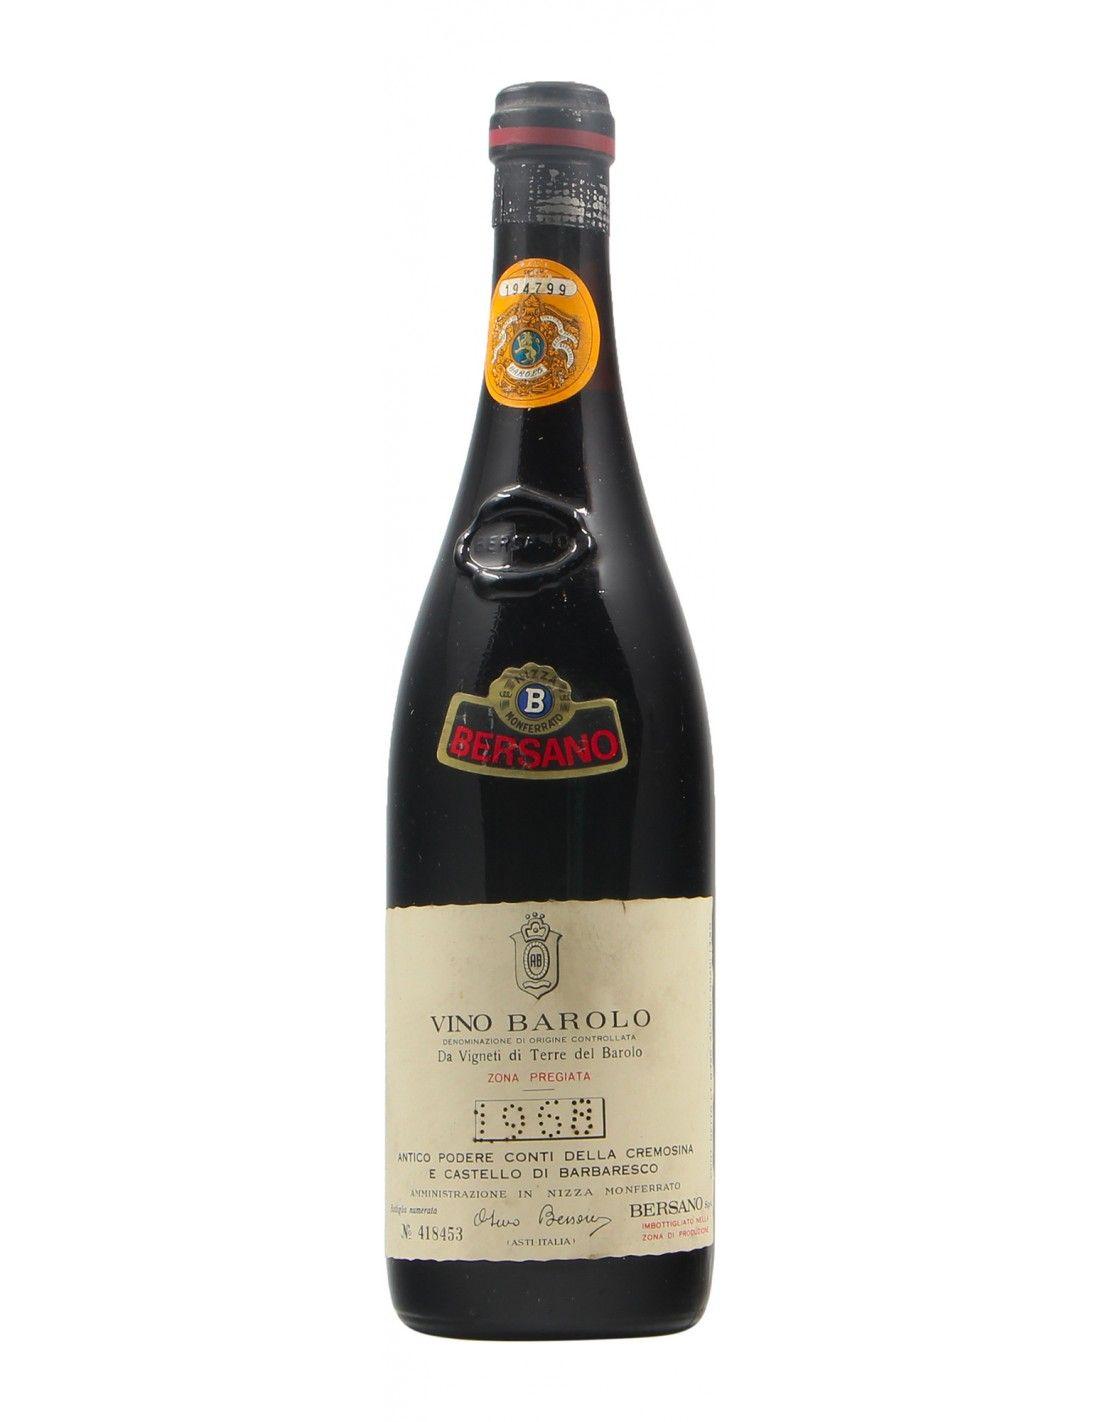 BAROLO 1968 BERSANO Grandi Bottiglie